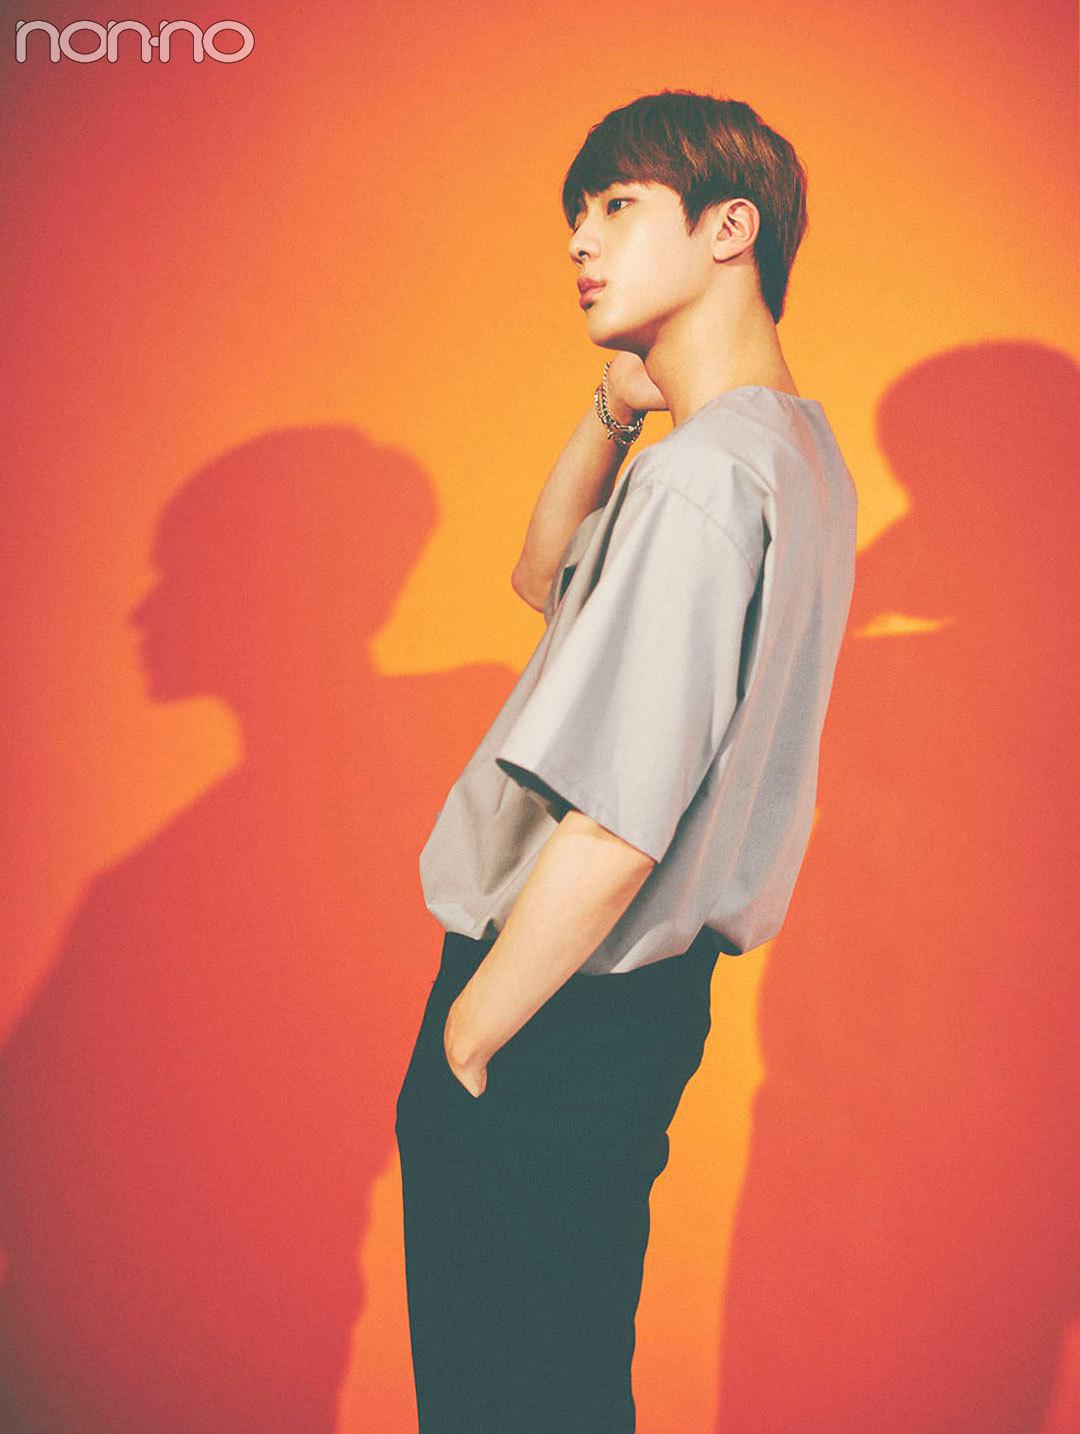 BTS – Nonno Photoshoot